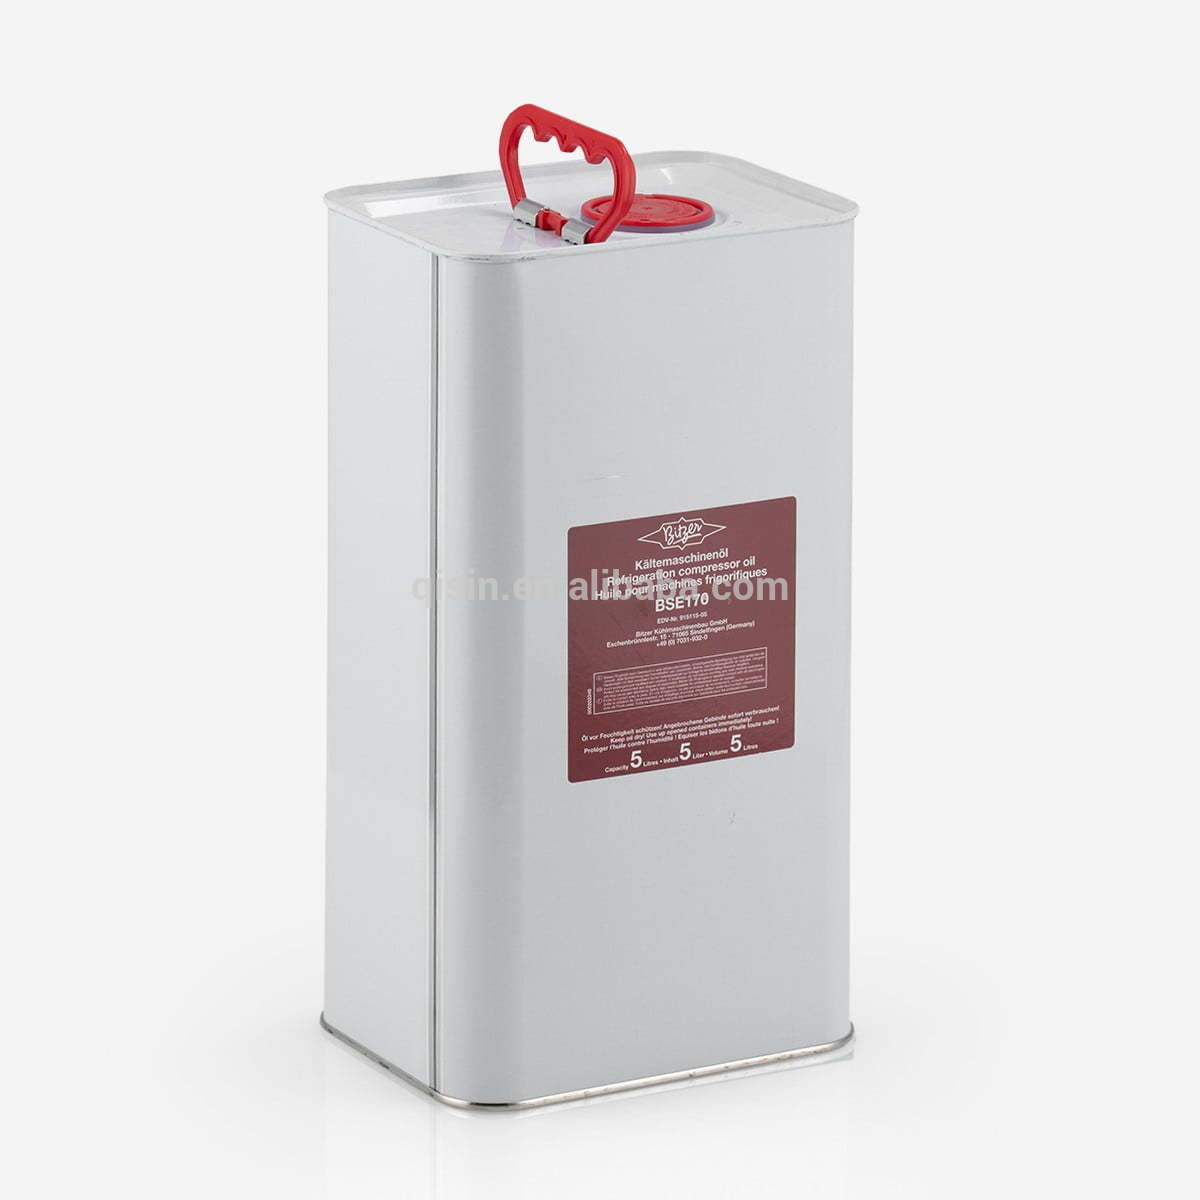 Подлинное масло компрессора (B5.2 BSE32 BSE55 B100 B150SH BSE170 B320SH) для R134a R404A R407 R507A R1234yf R513A R450a